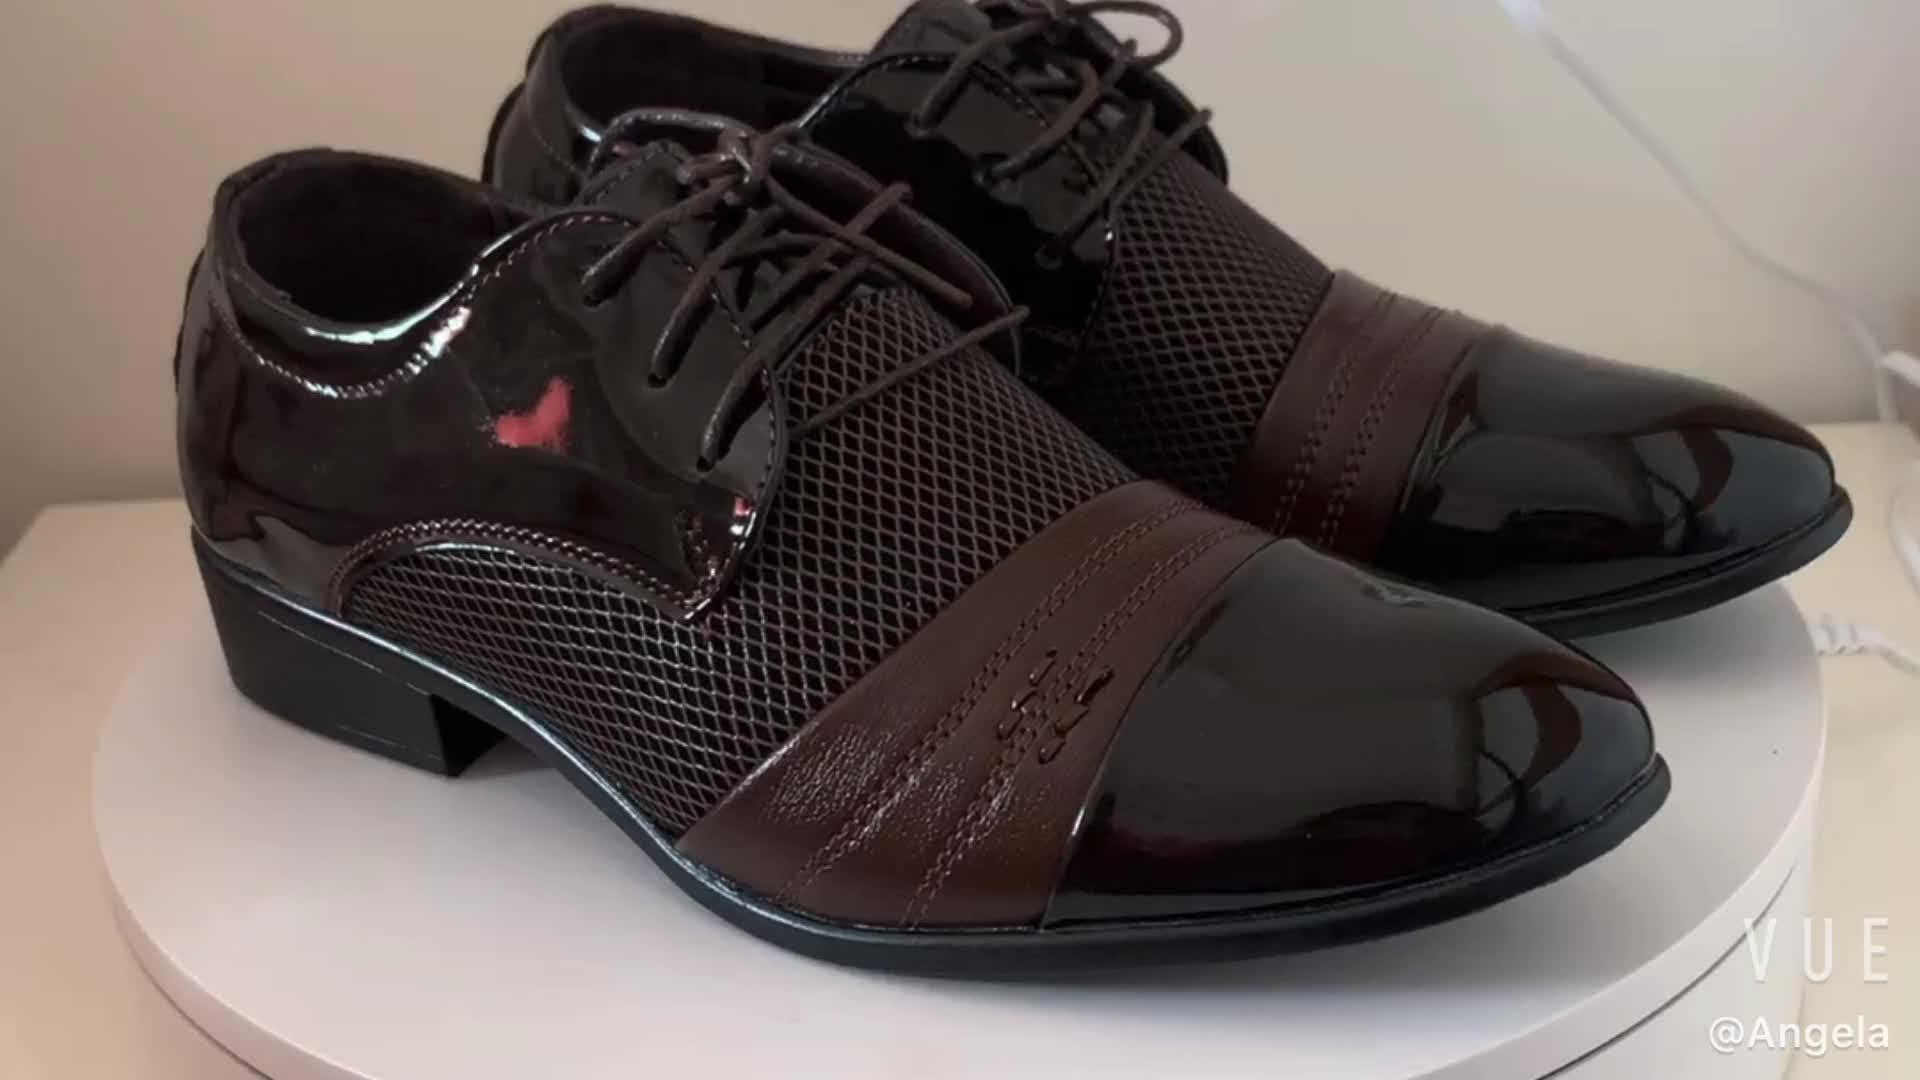 Sh10113aราคาถูกหุ้นหนังรองเท้าผู้ชายระบายอากาศกลวงออกชุดหนังชายรองเท้า